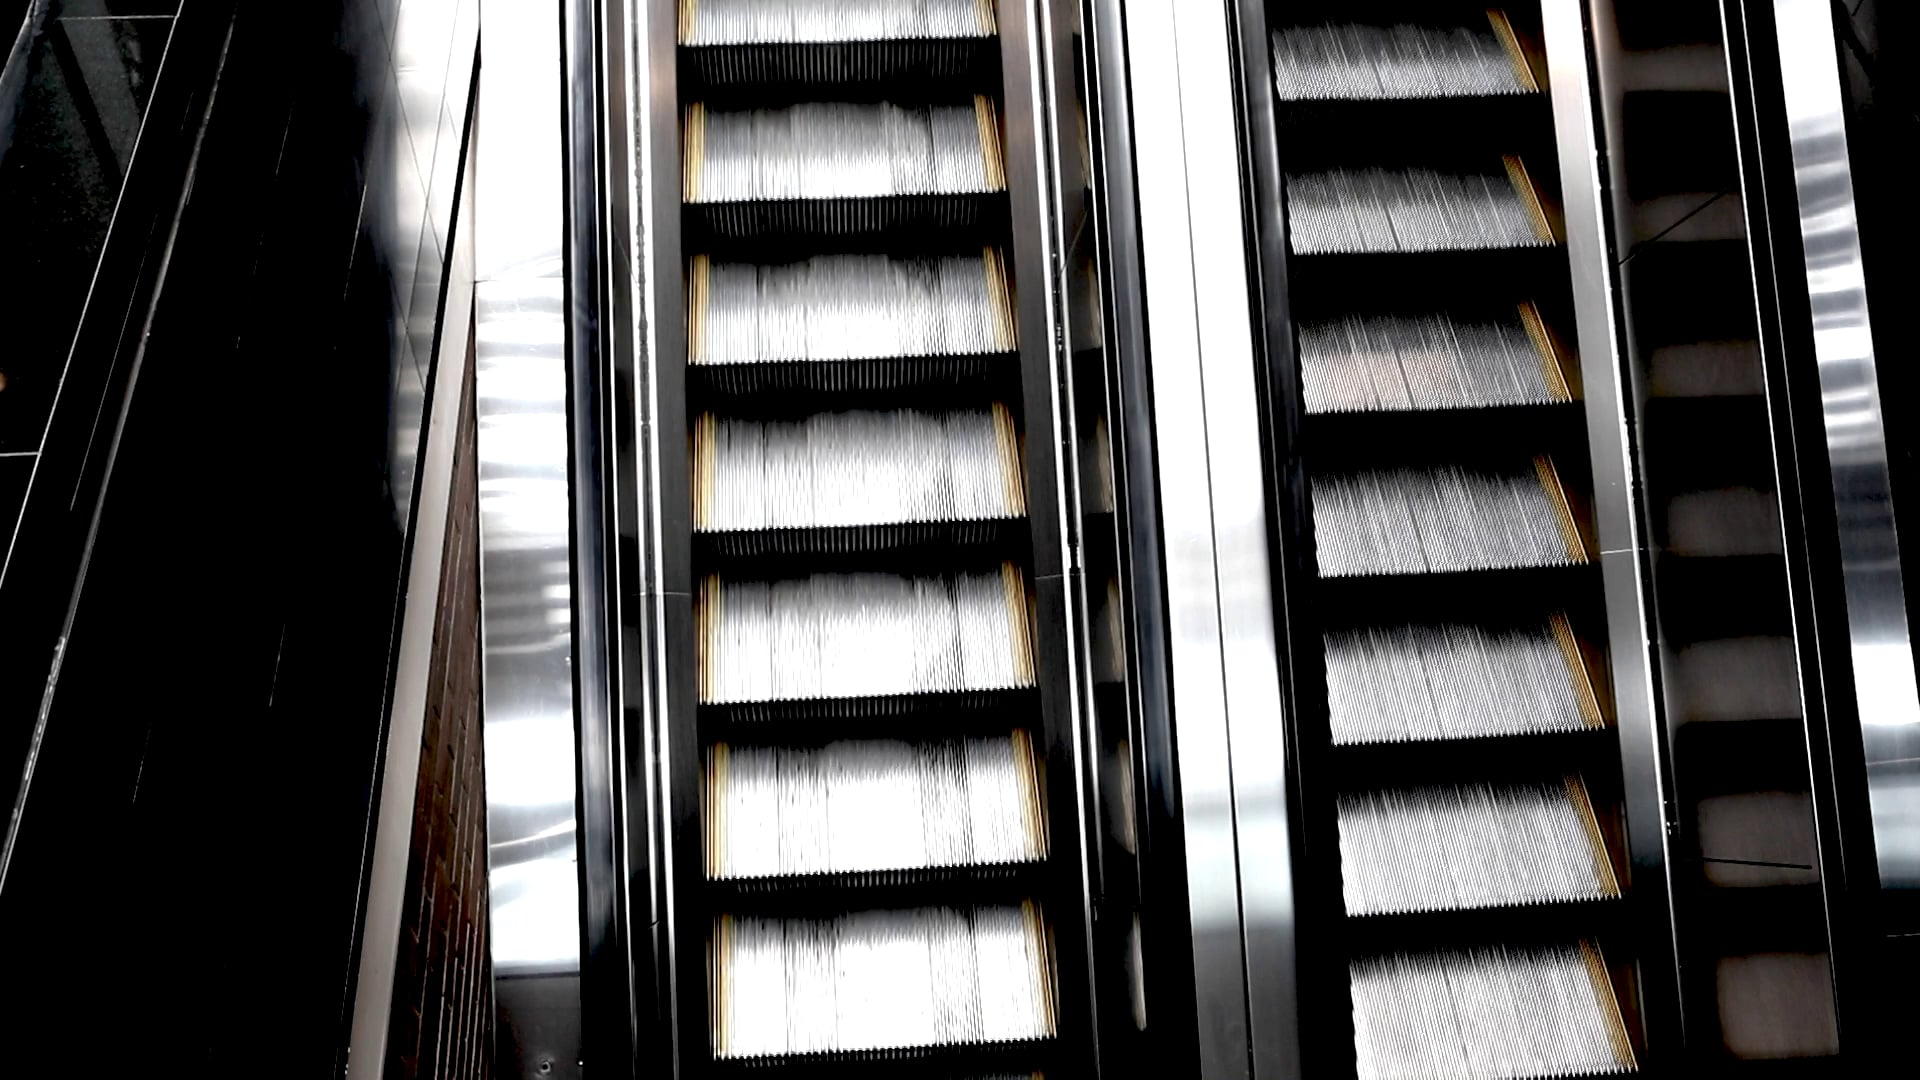 Endless Vertical Escalator